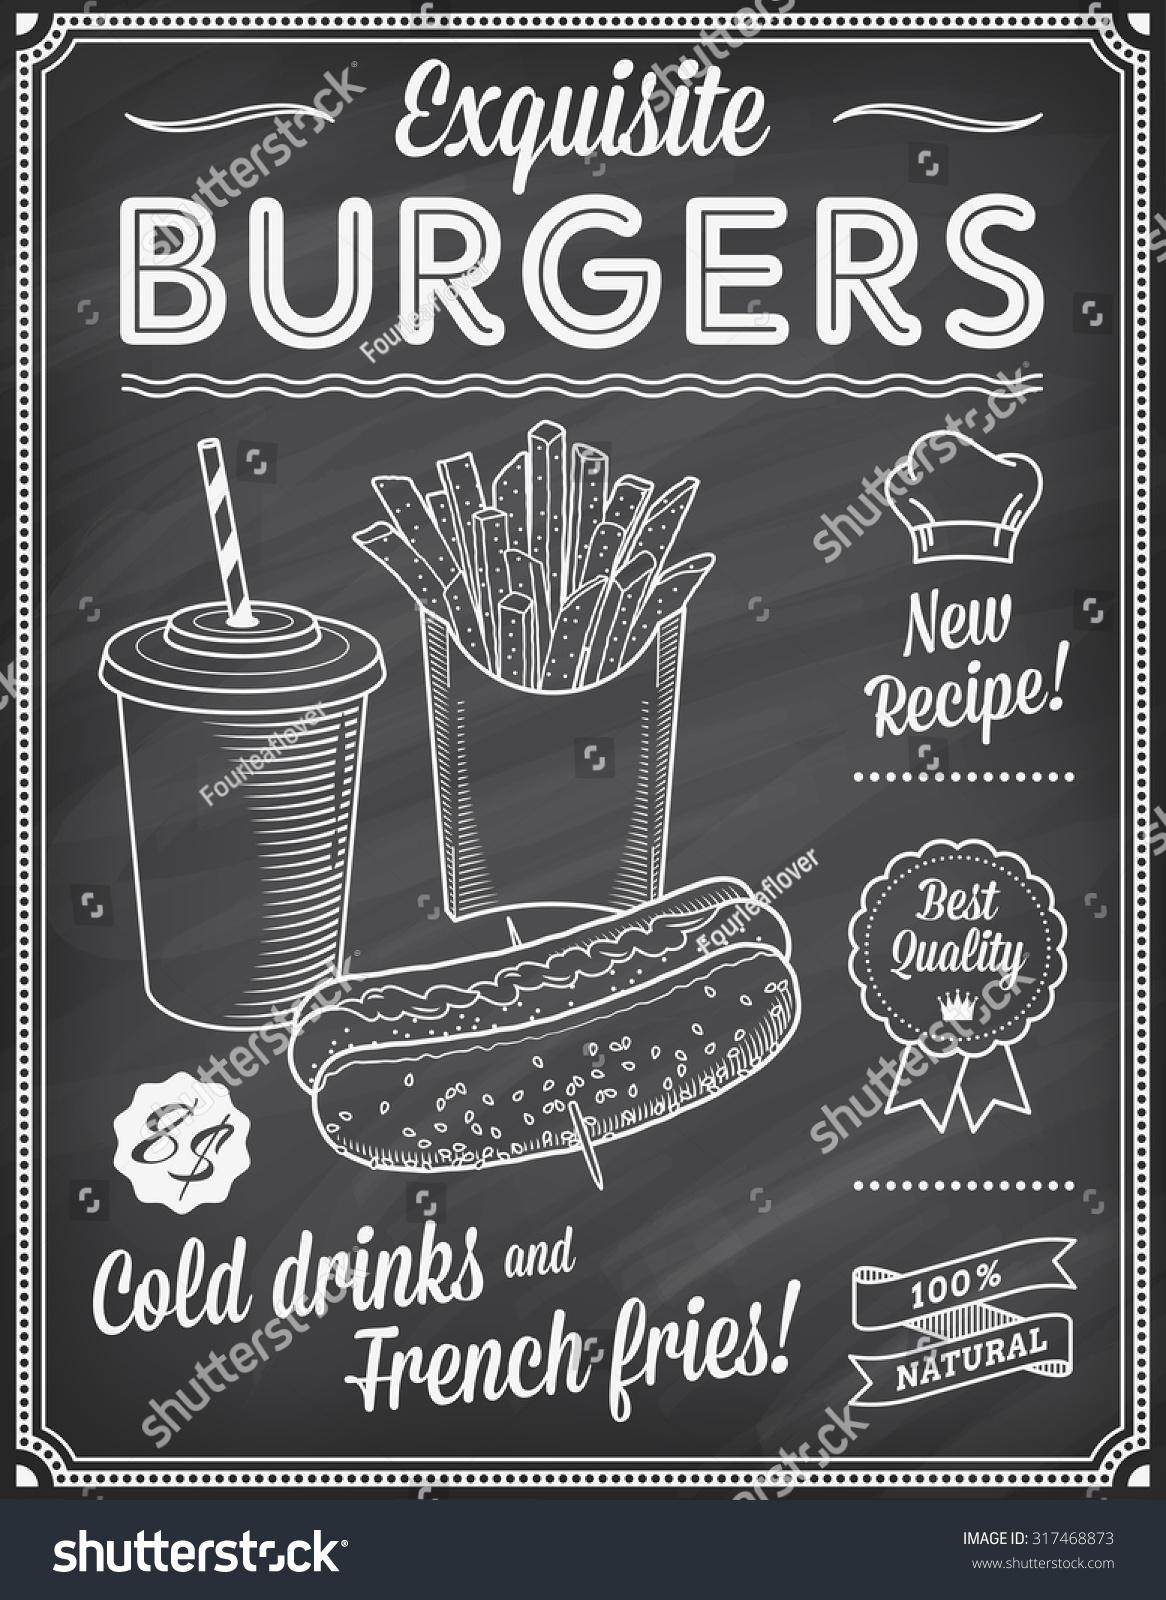 Grunge Chalkboard Fast Food Menu Template Stock Vector 317468873 Shutterstock